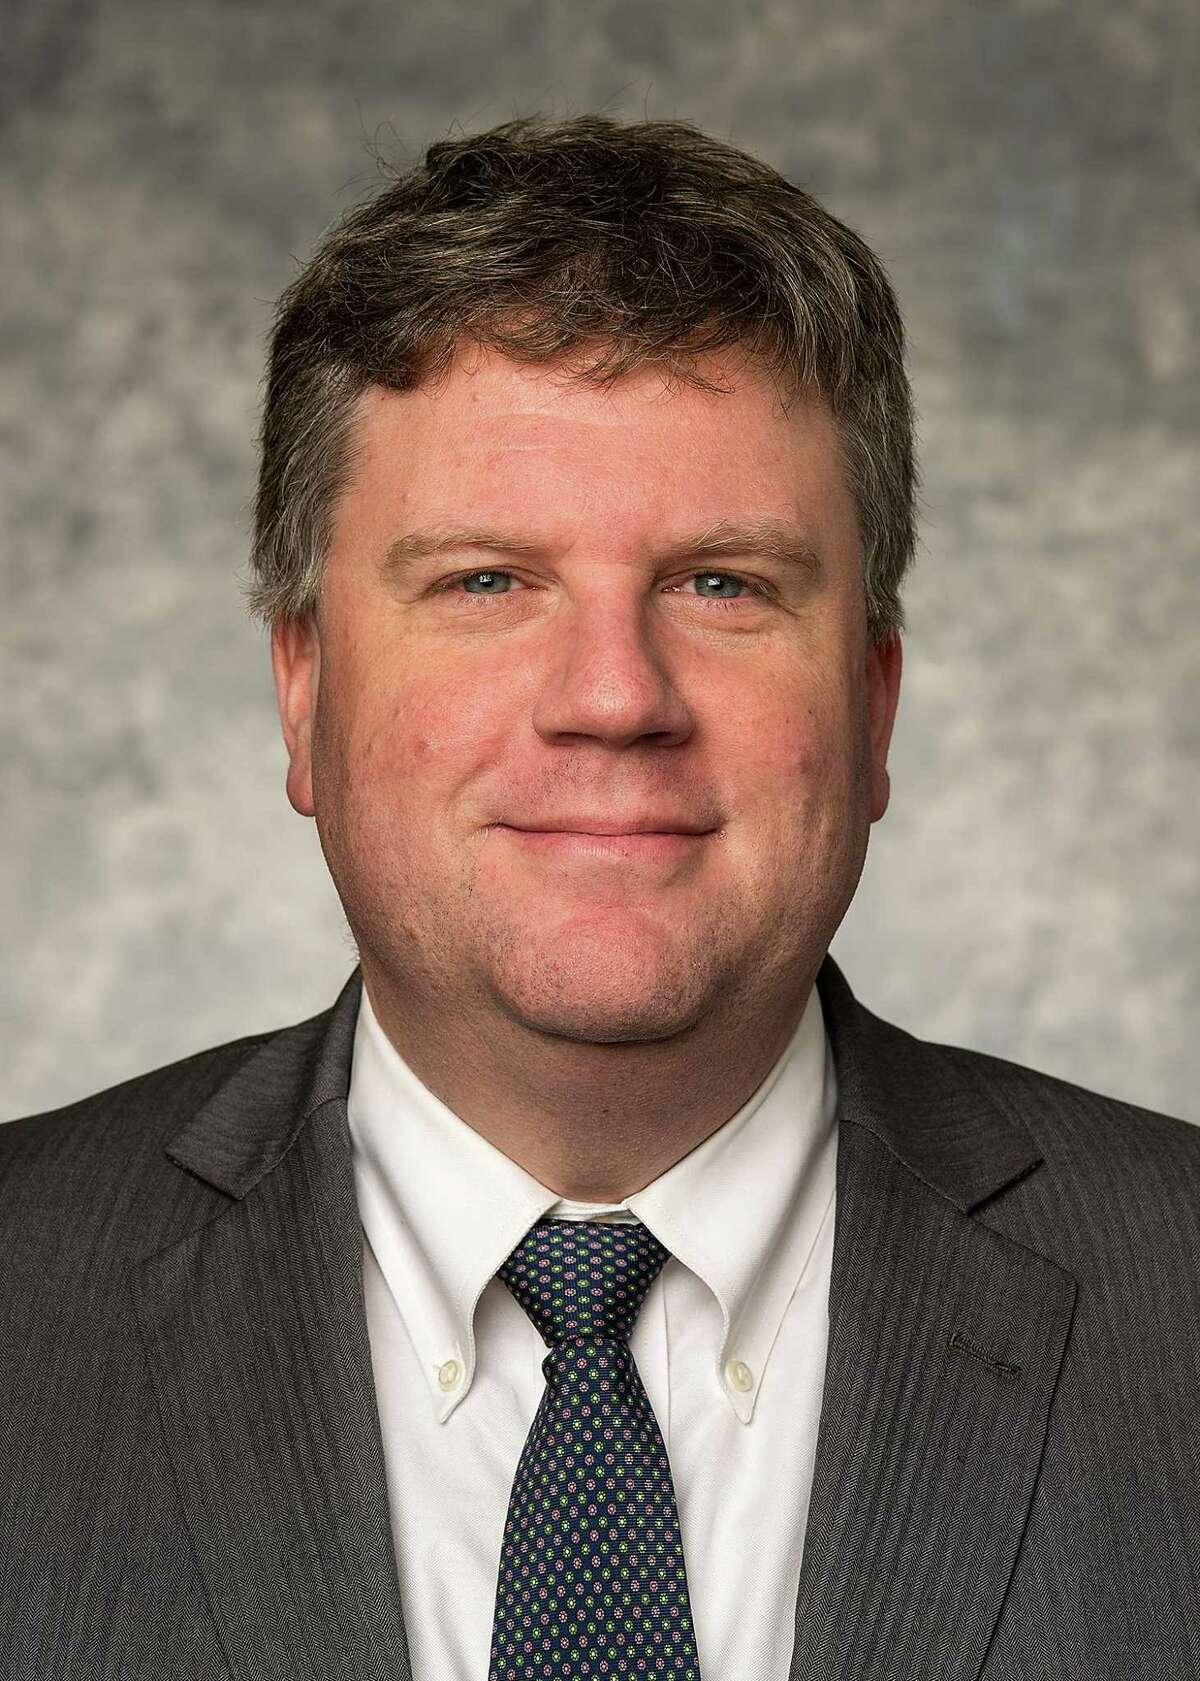 Dr. Andrew Gerber